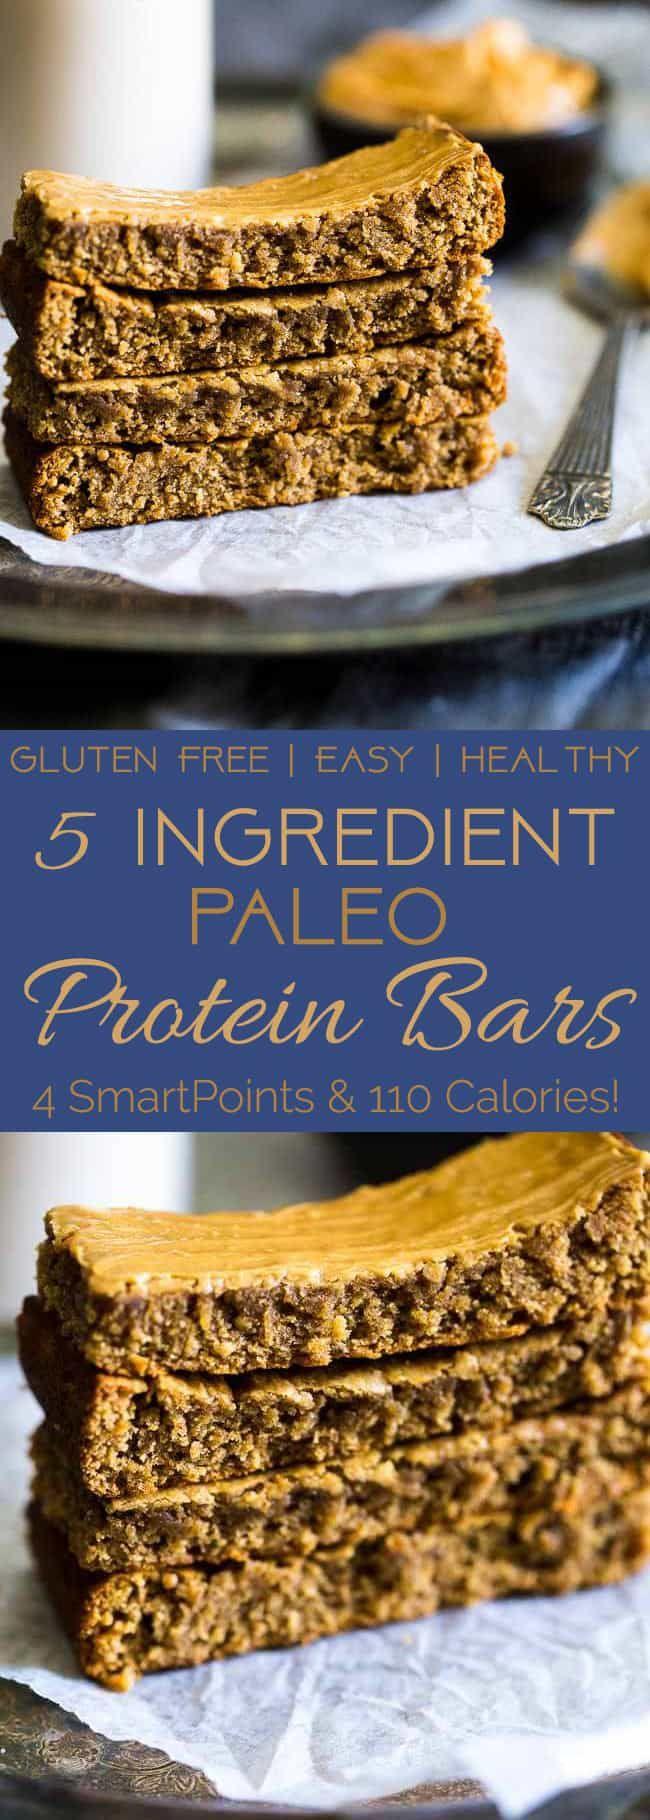 Cinnamon Collagen Protein Bars Paleo Keto Bake It Paleo Recipe In 2021 Low Carb Protein Bars Protein Bar Recipes Paleo Protein Bars